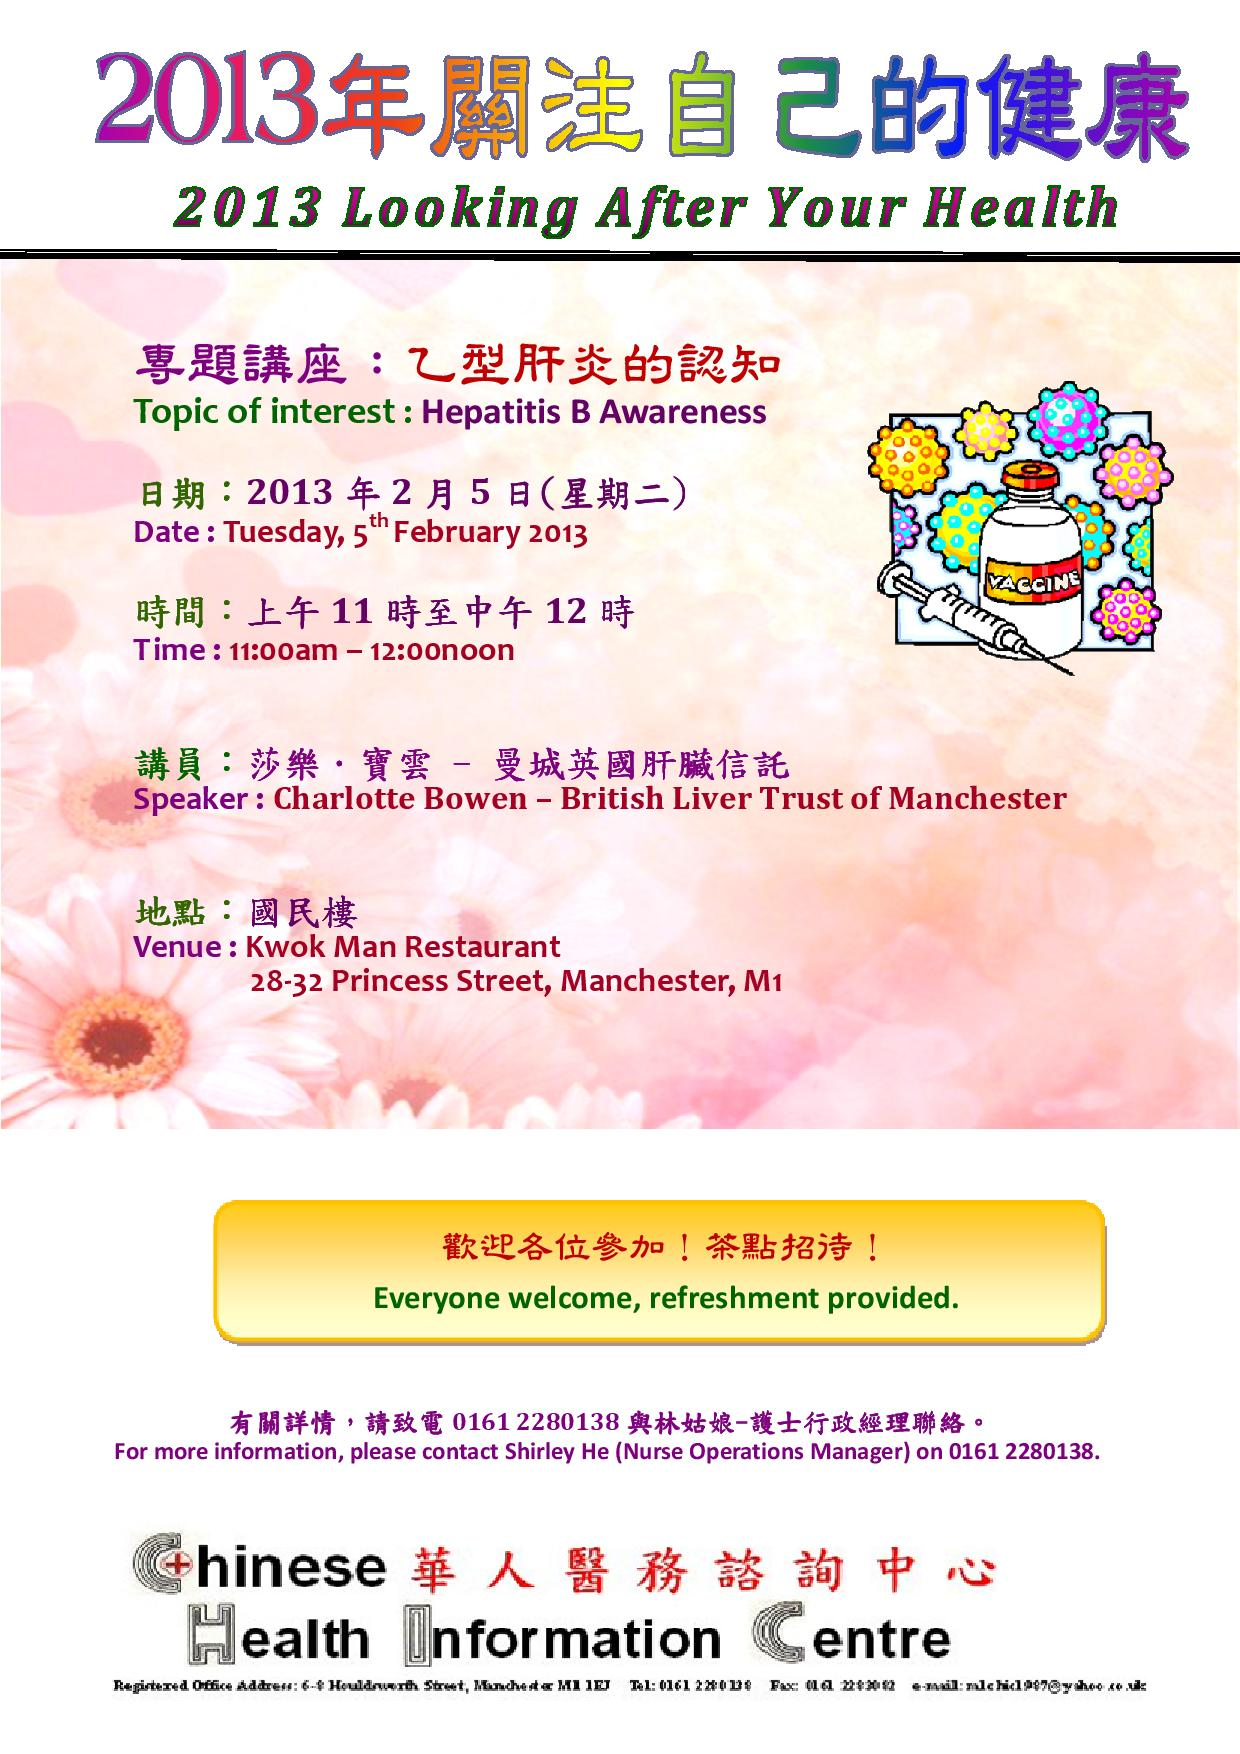 Hepatitis B Awareness